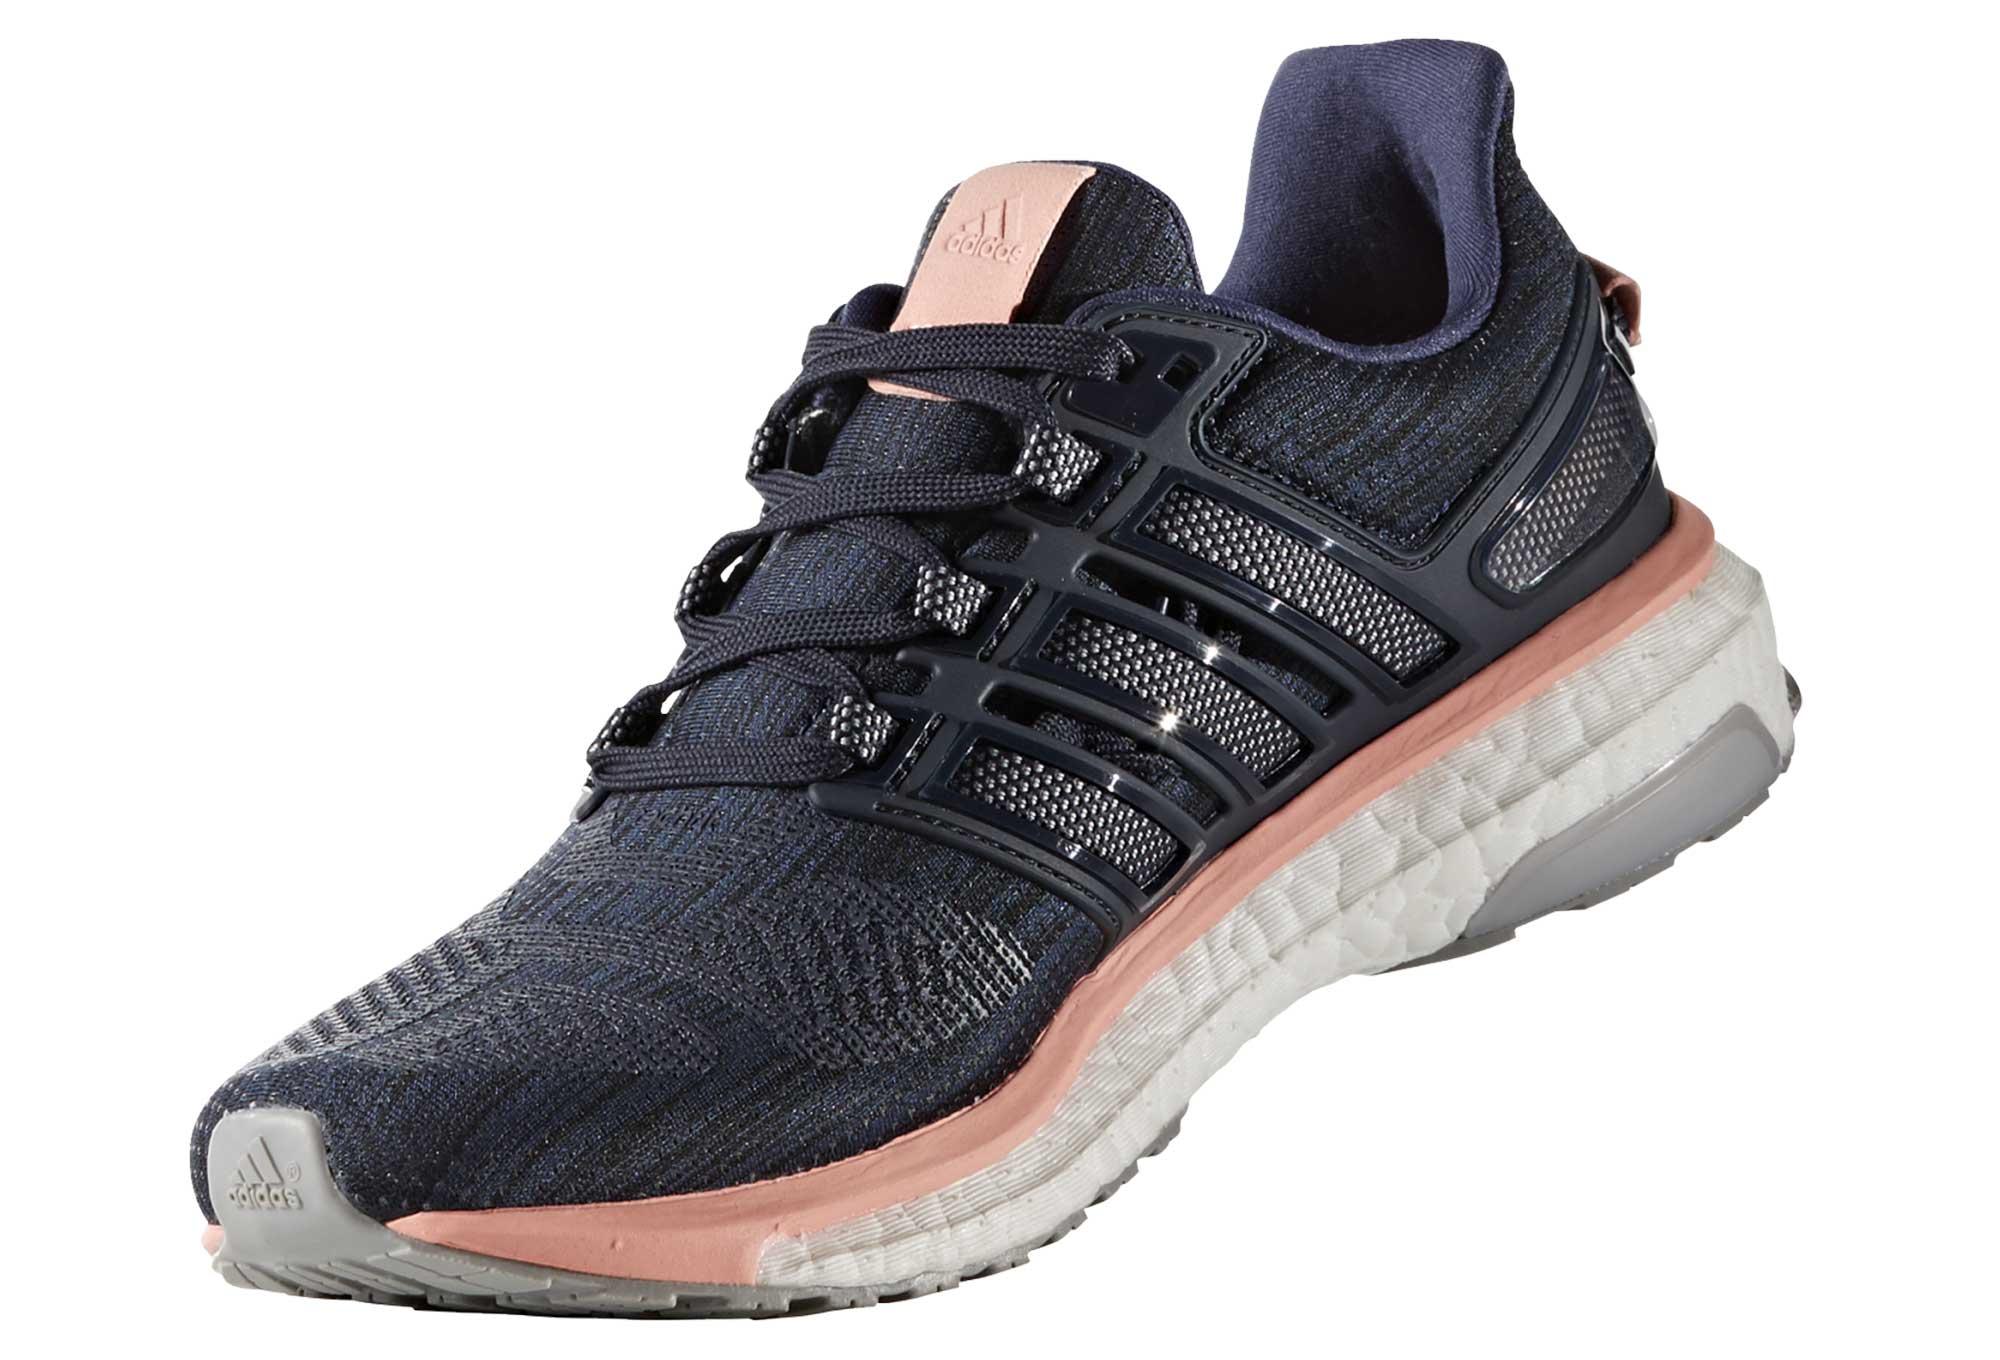 849f67e2c9da0 Zapatillas adidas running Energy Boost 3 para Mujer Azul